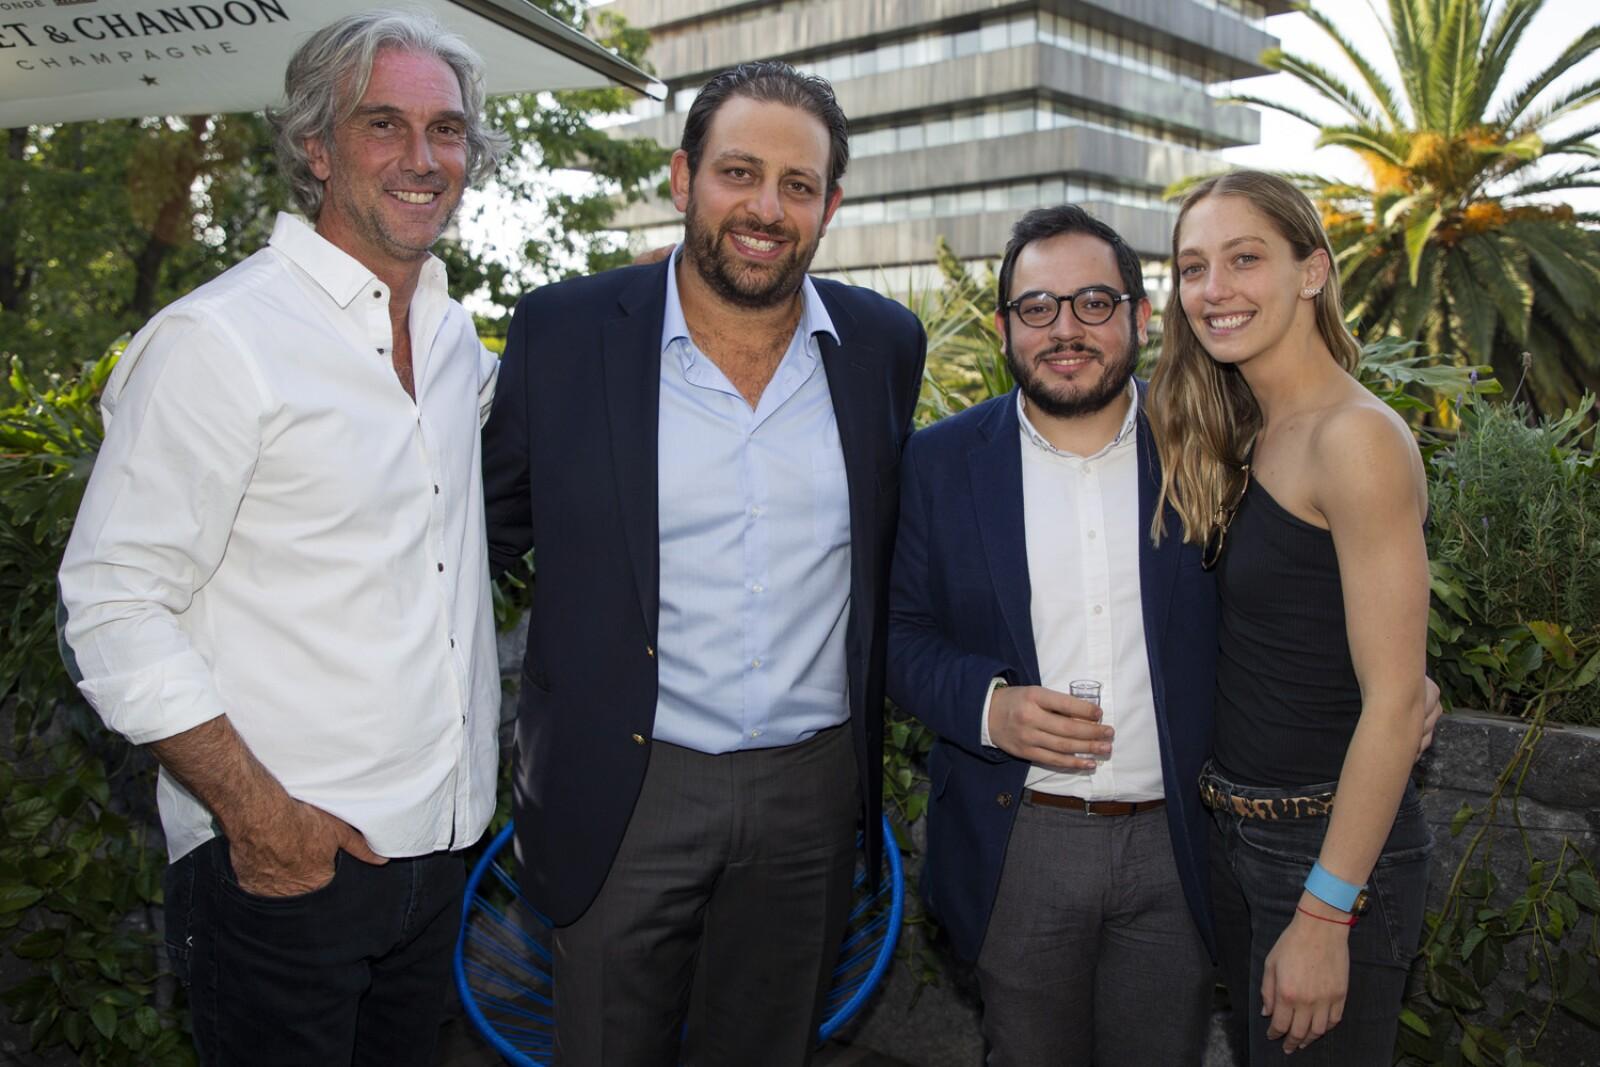 Marcelo Imposti, Adolfo Salame, Marco Larios, Daniela Skidelsky